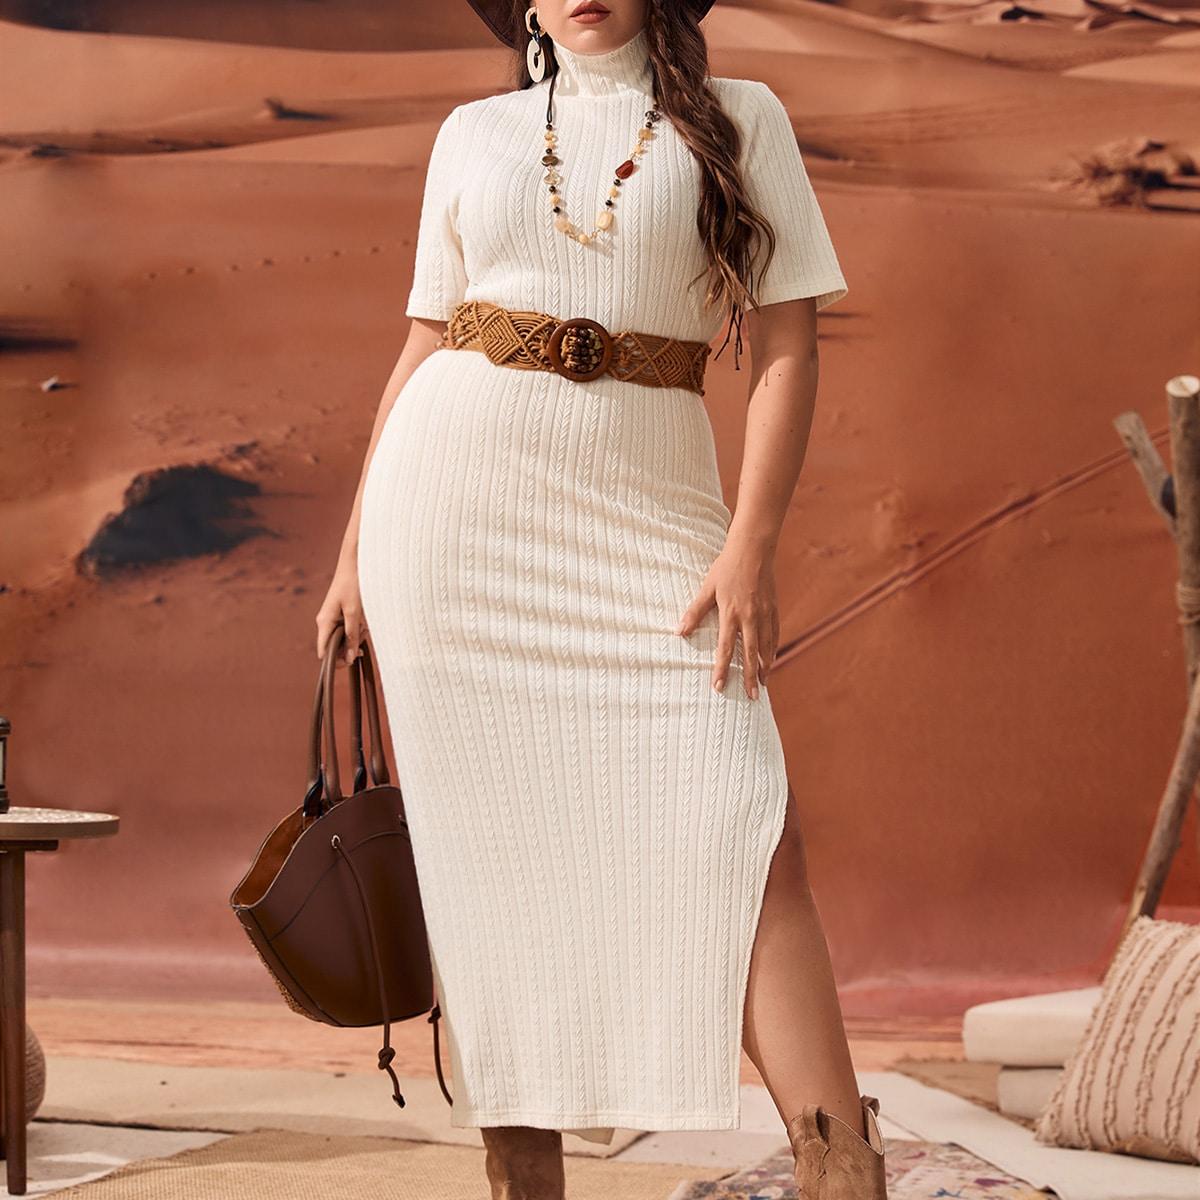 Plus High Neck Slit Thigh Textured Bodycon Dress